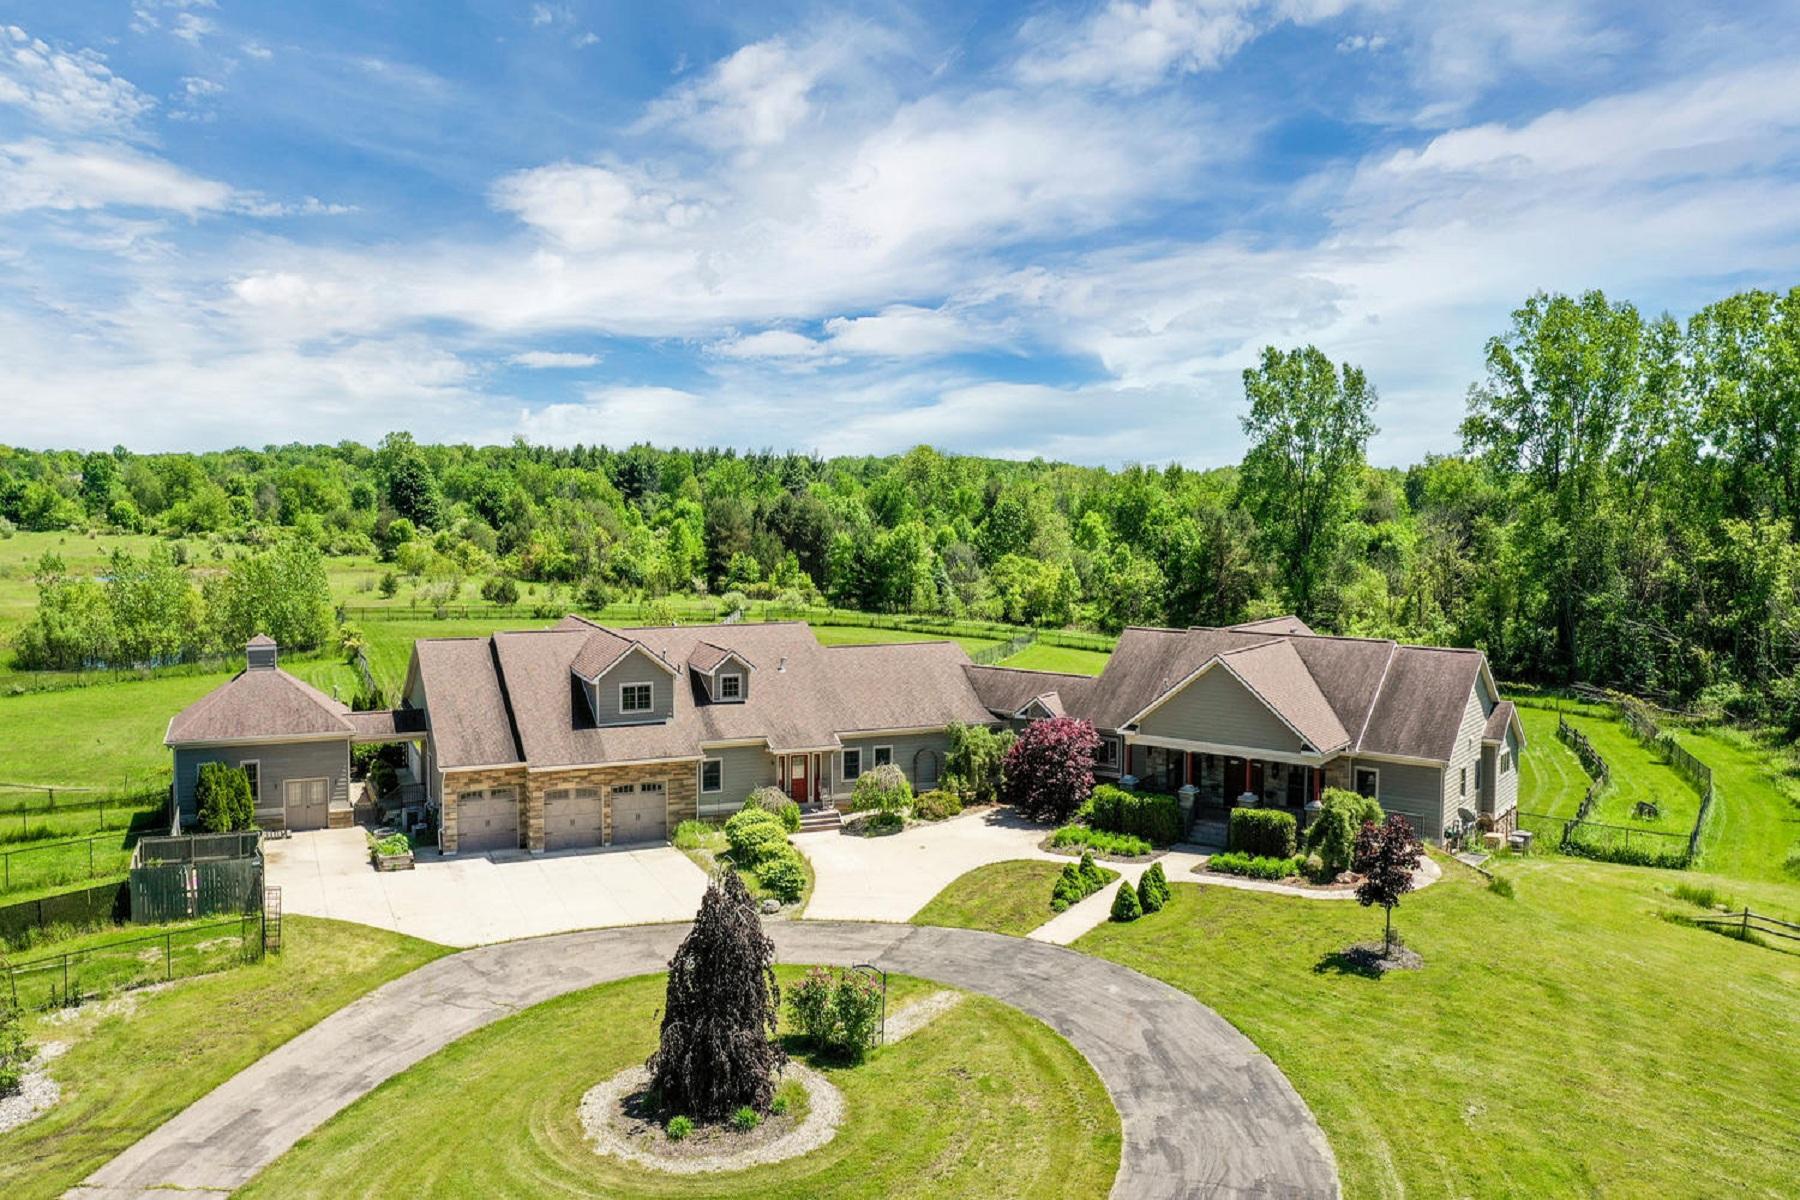 Single Family Homes for Sale at Williamston 102 Turner Road Williamston, Michigan 48895 United States